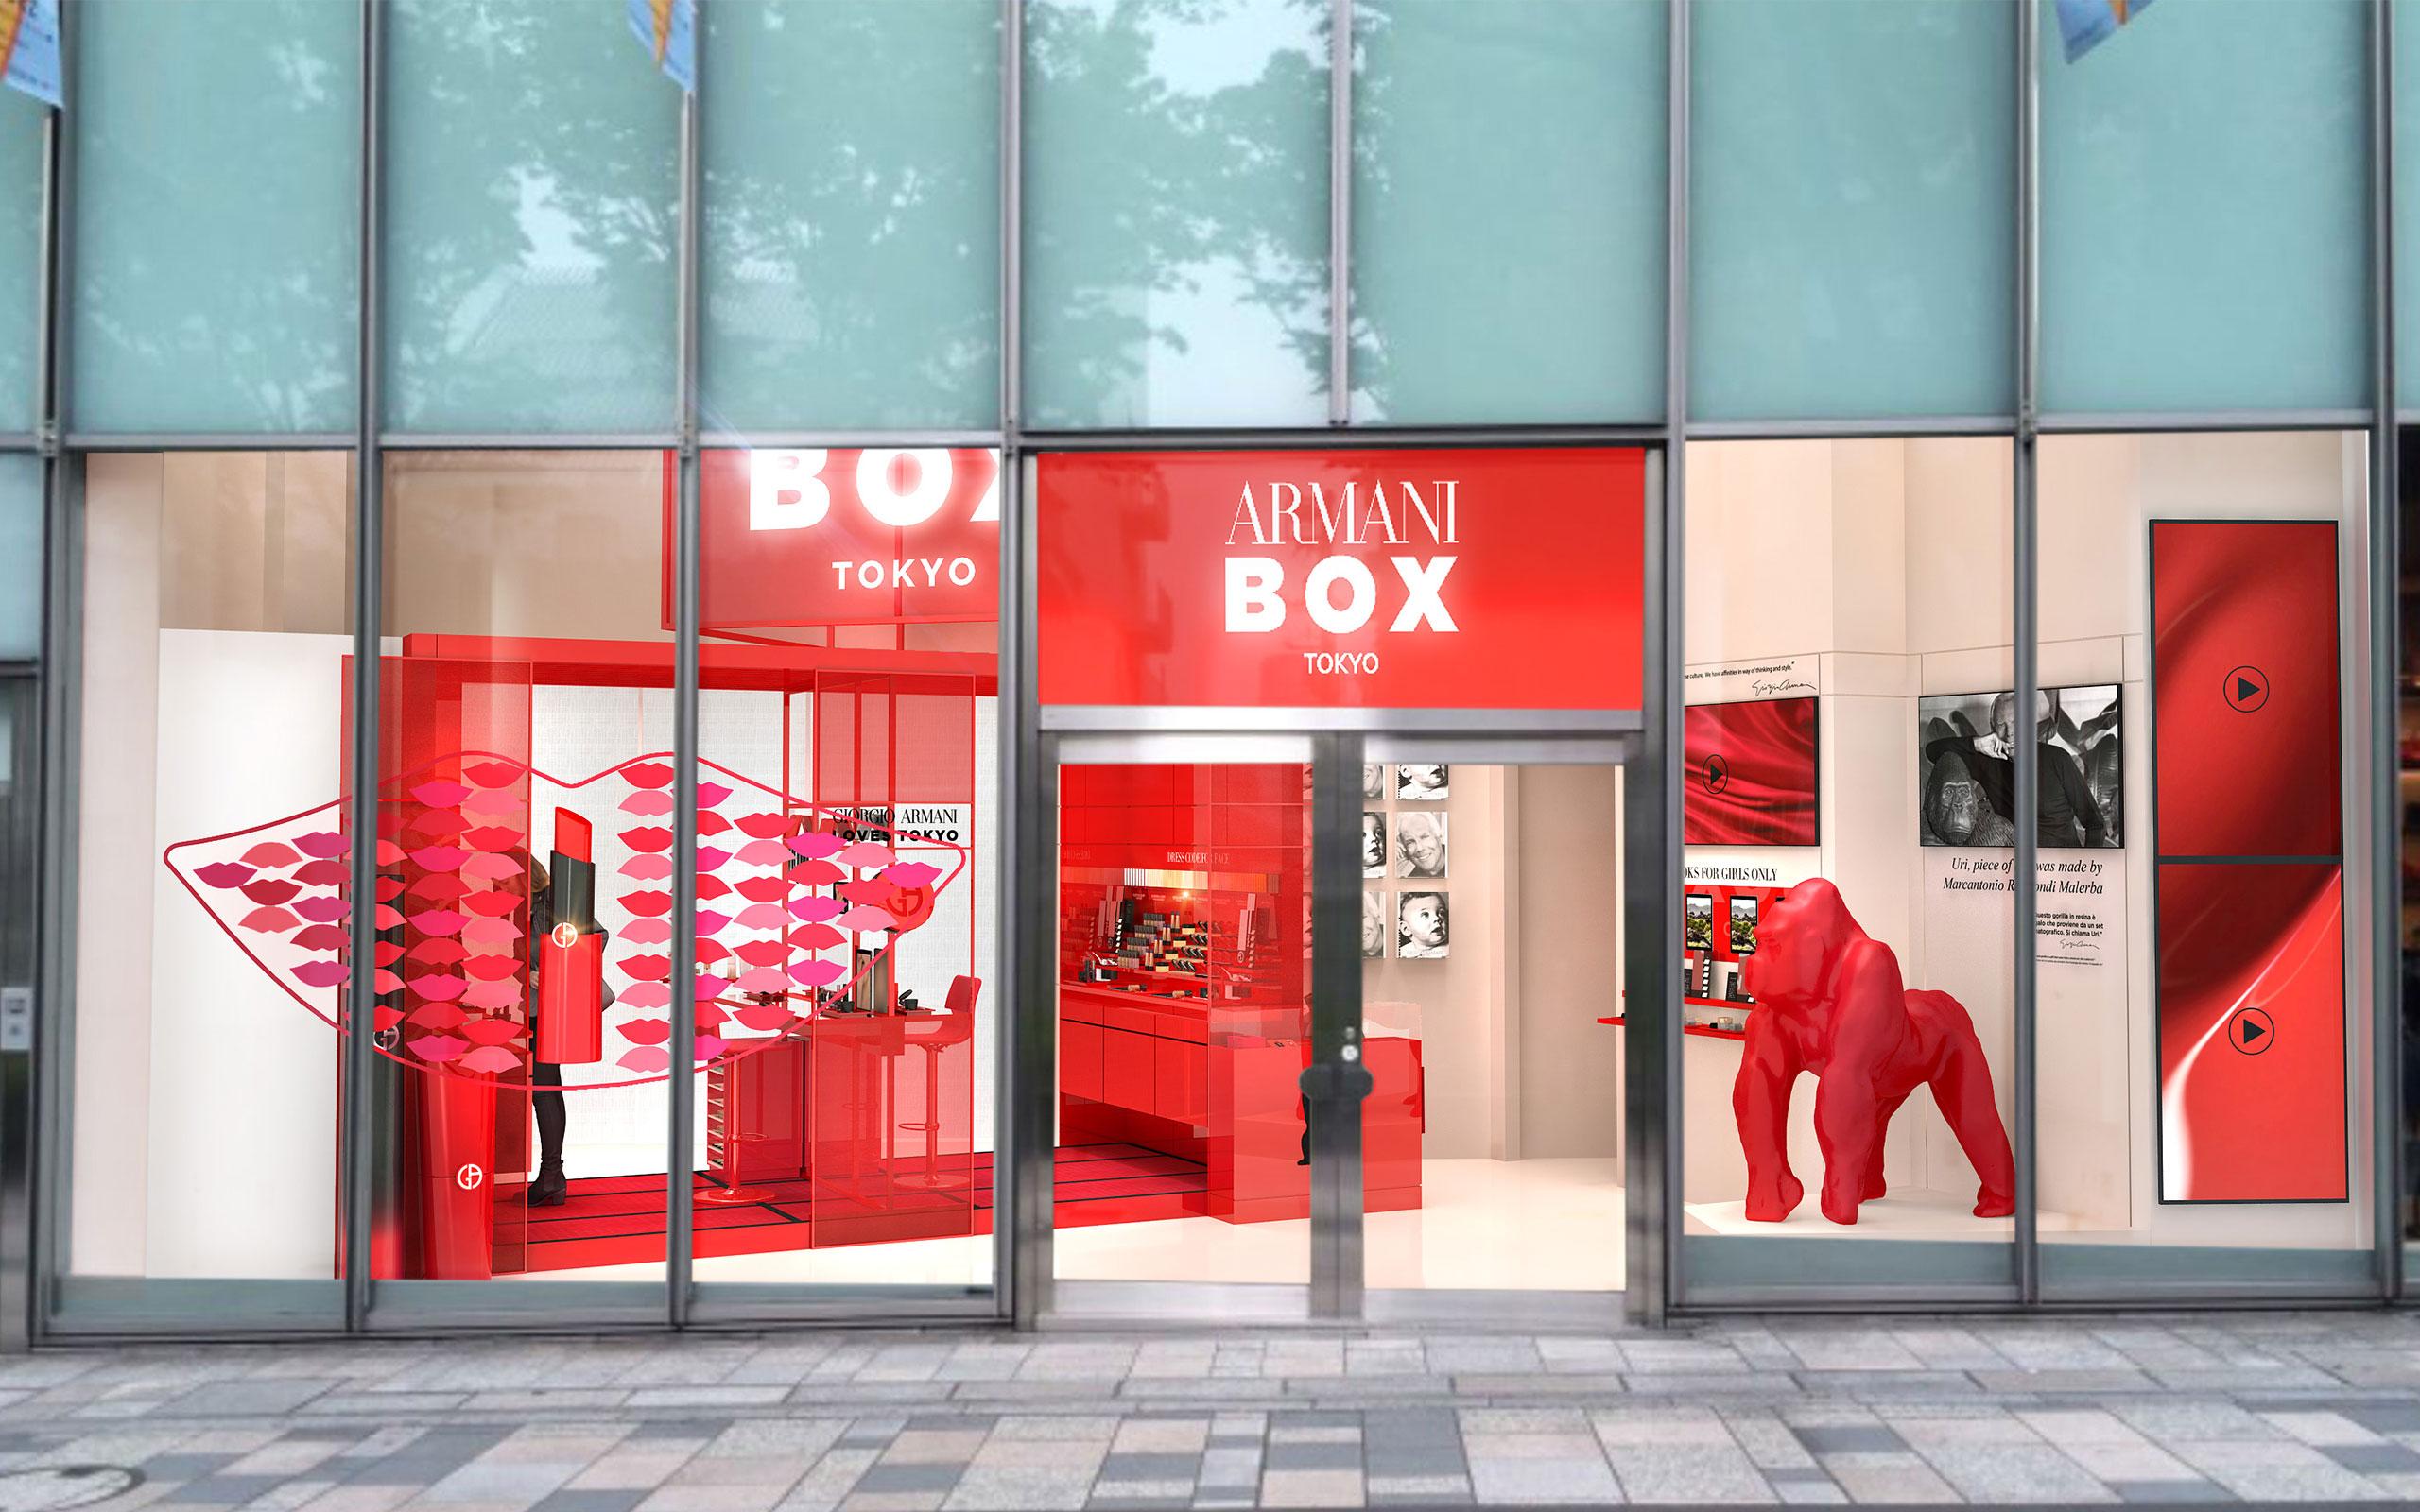 Giorgio Armani Beauty Opens 'Armani Box' At Omotesando Hills